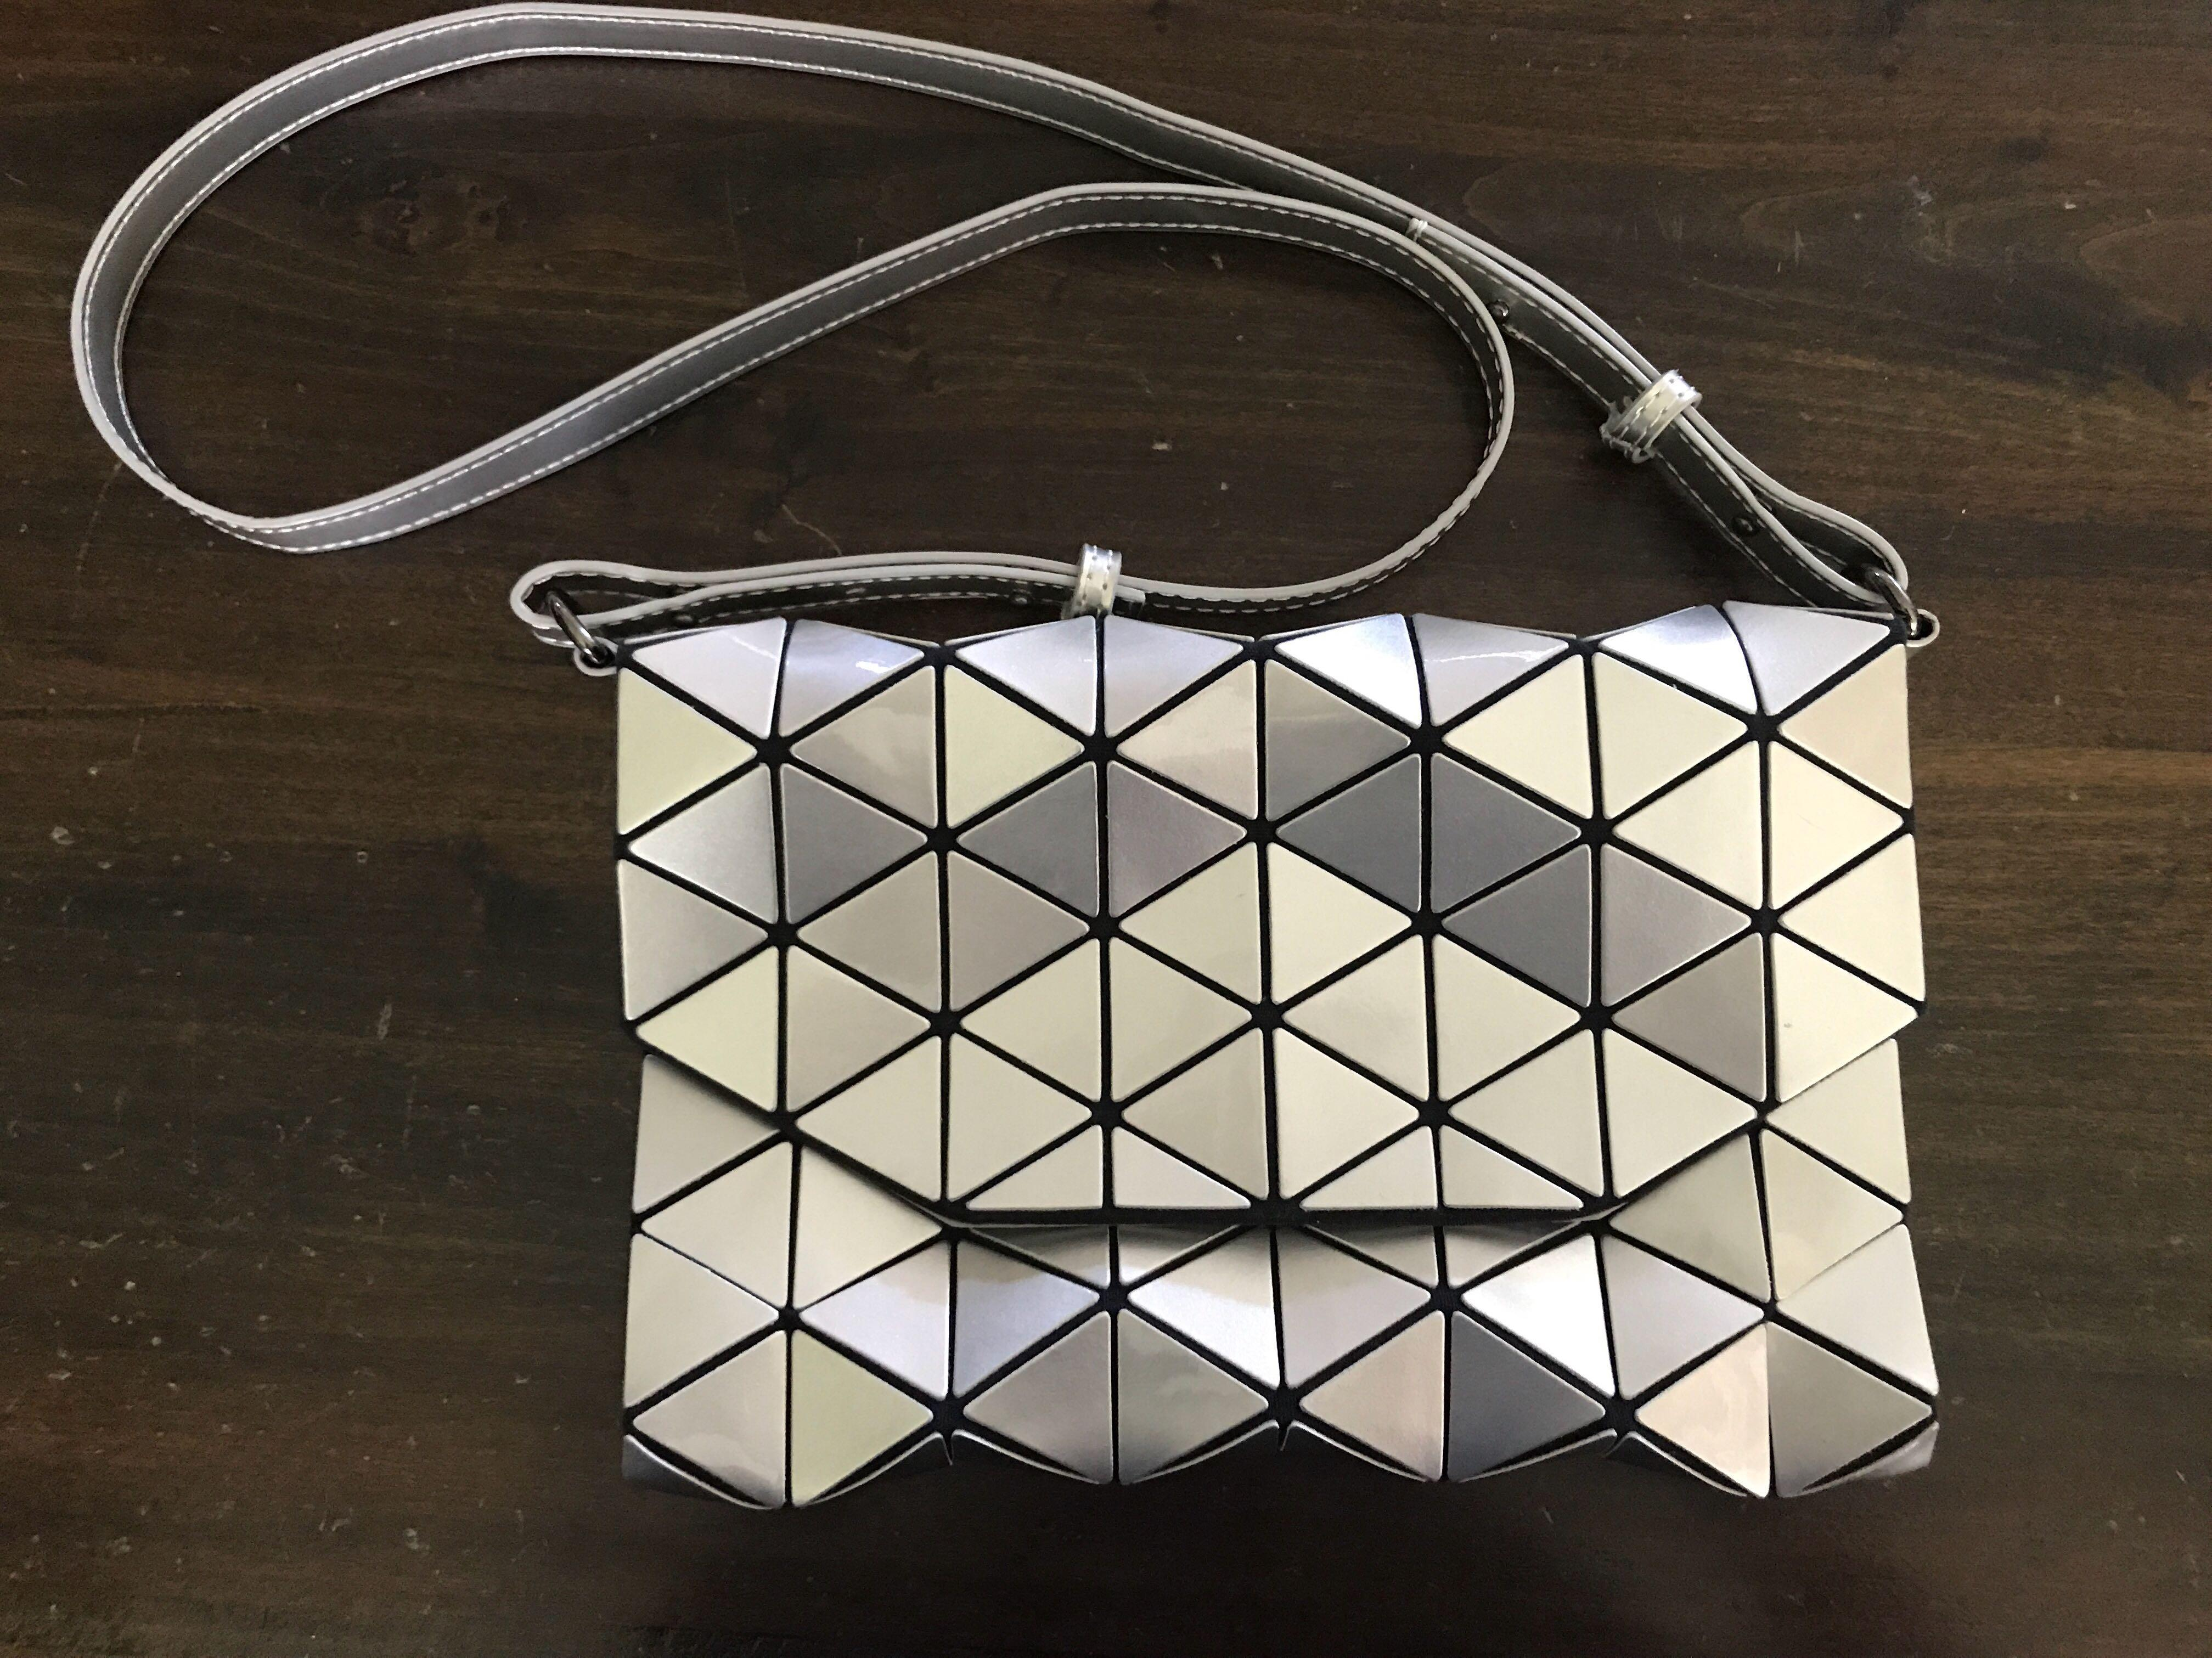 Almost new Issey Miyake Bao Bao inspired bag clutch